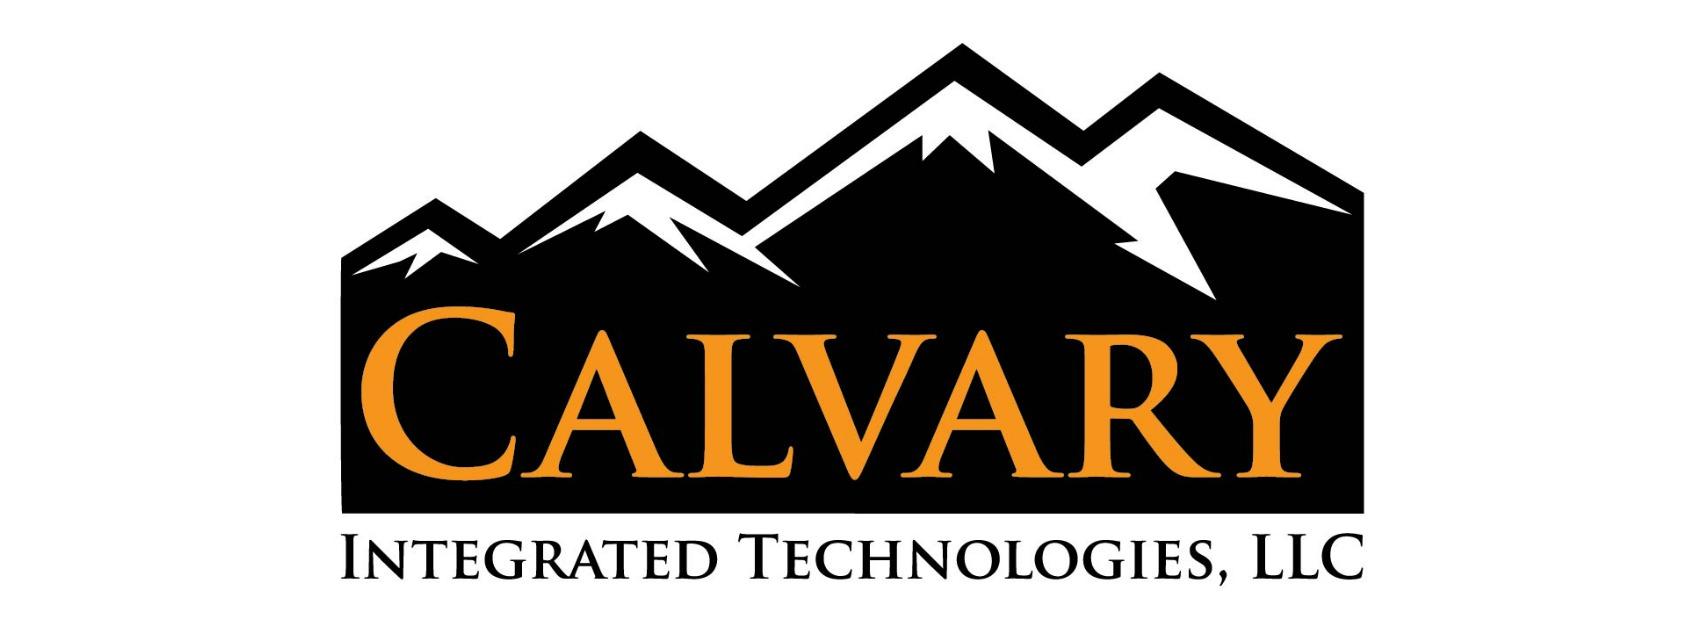 Calvary Intergraded Technologies, LLC.